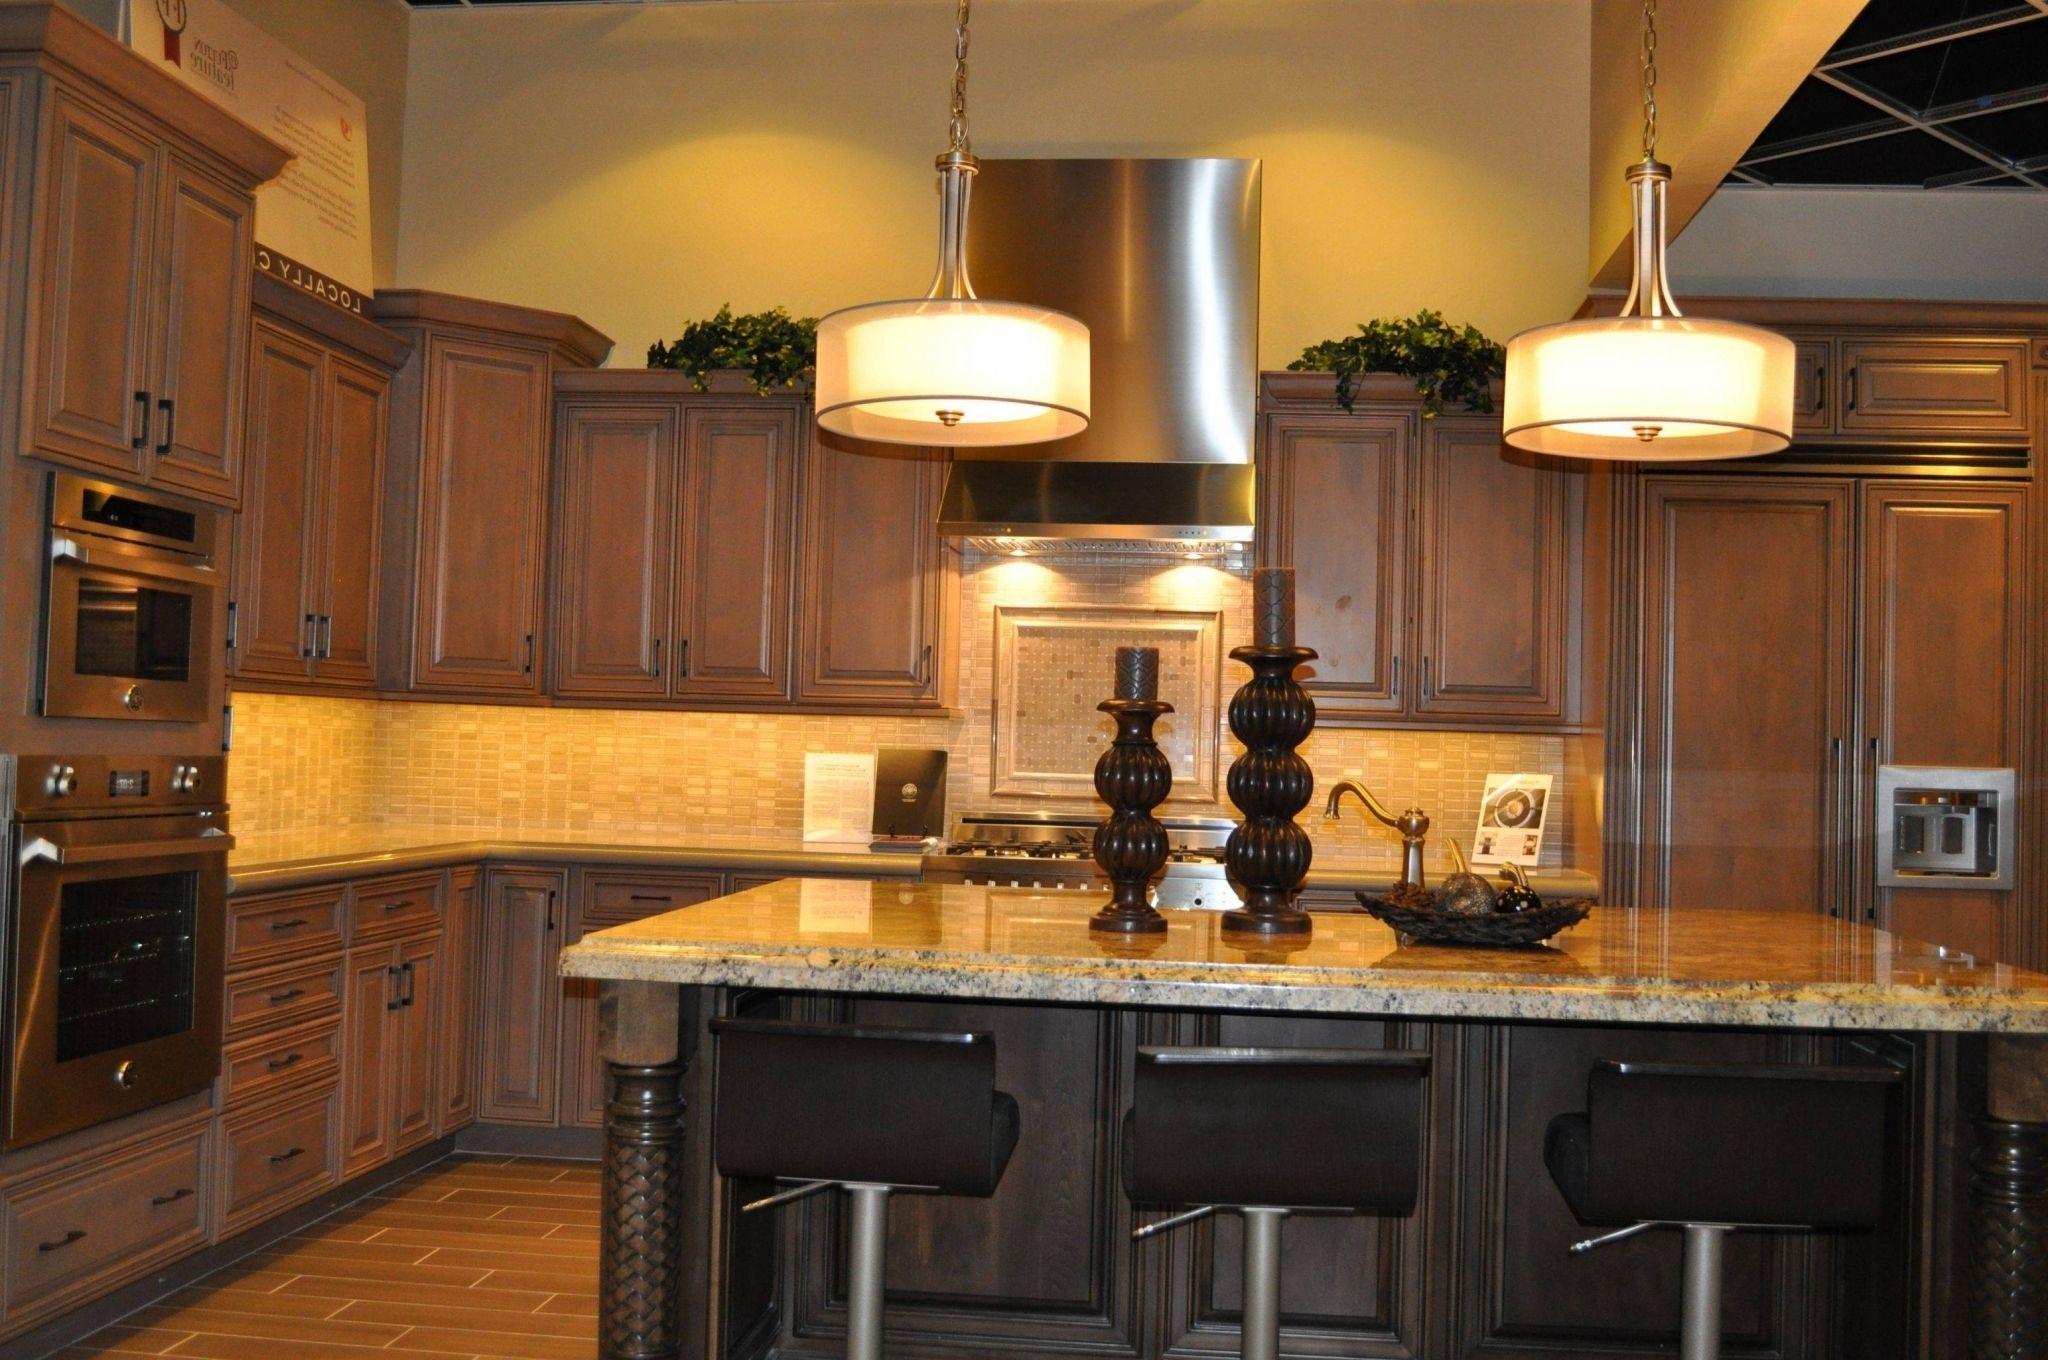 Kraftmaid kitchen cabinets price list cheap kitchen island ideas check more at http